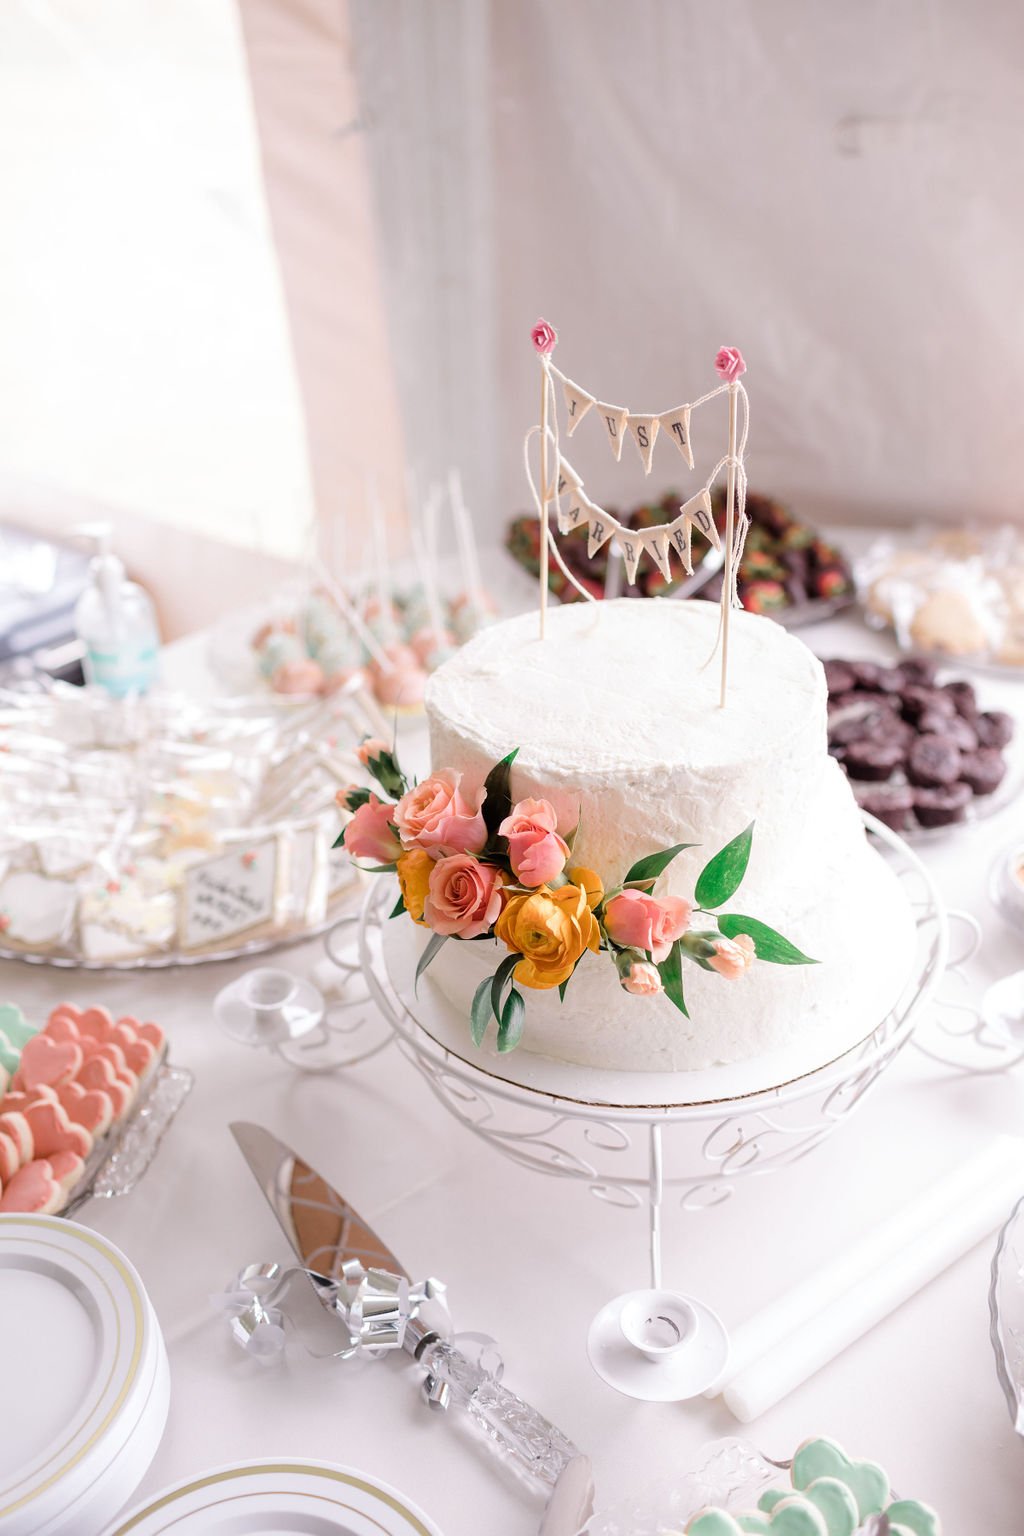 dreamy springtime wedding cake with white frosting